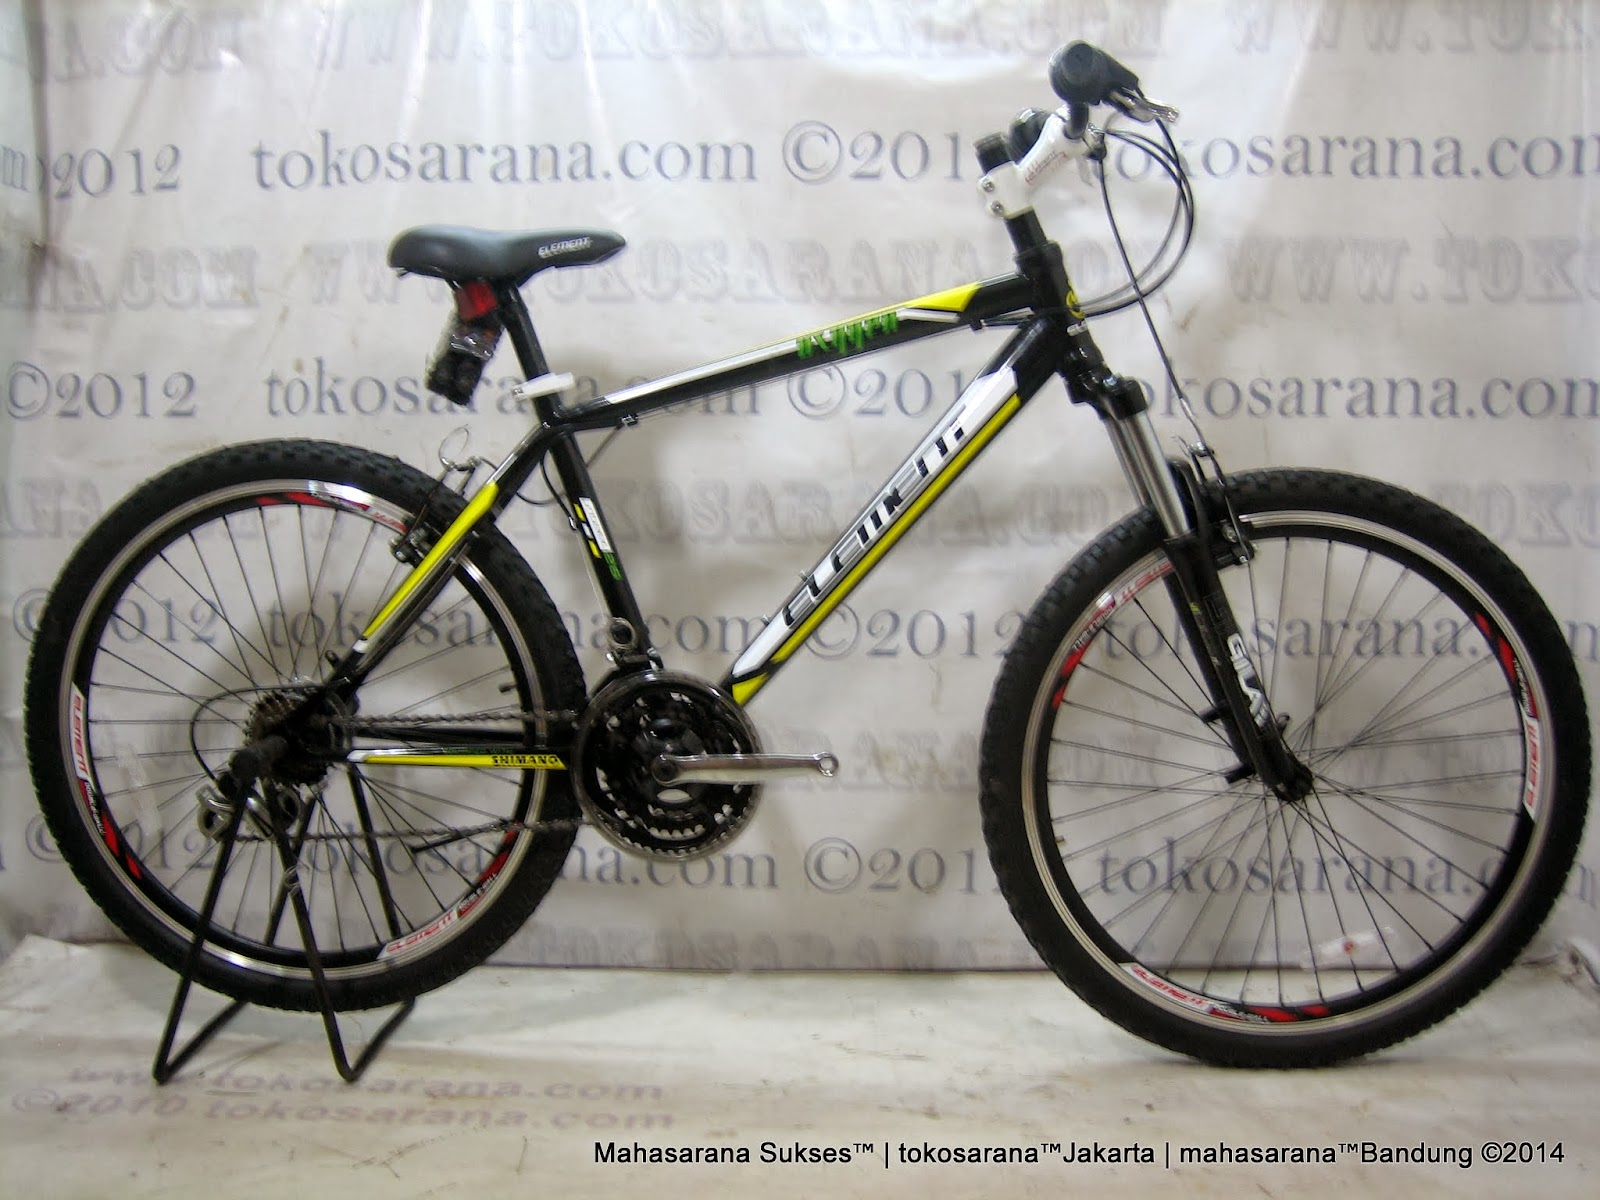 Limited Edition Sepeda Gunung Element Oxygen dengan RST Gila Travel 100mm Fork 26 Inci